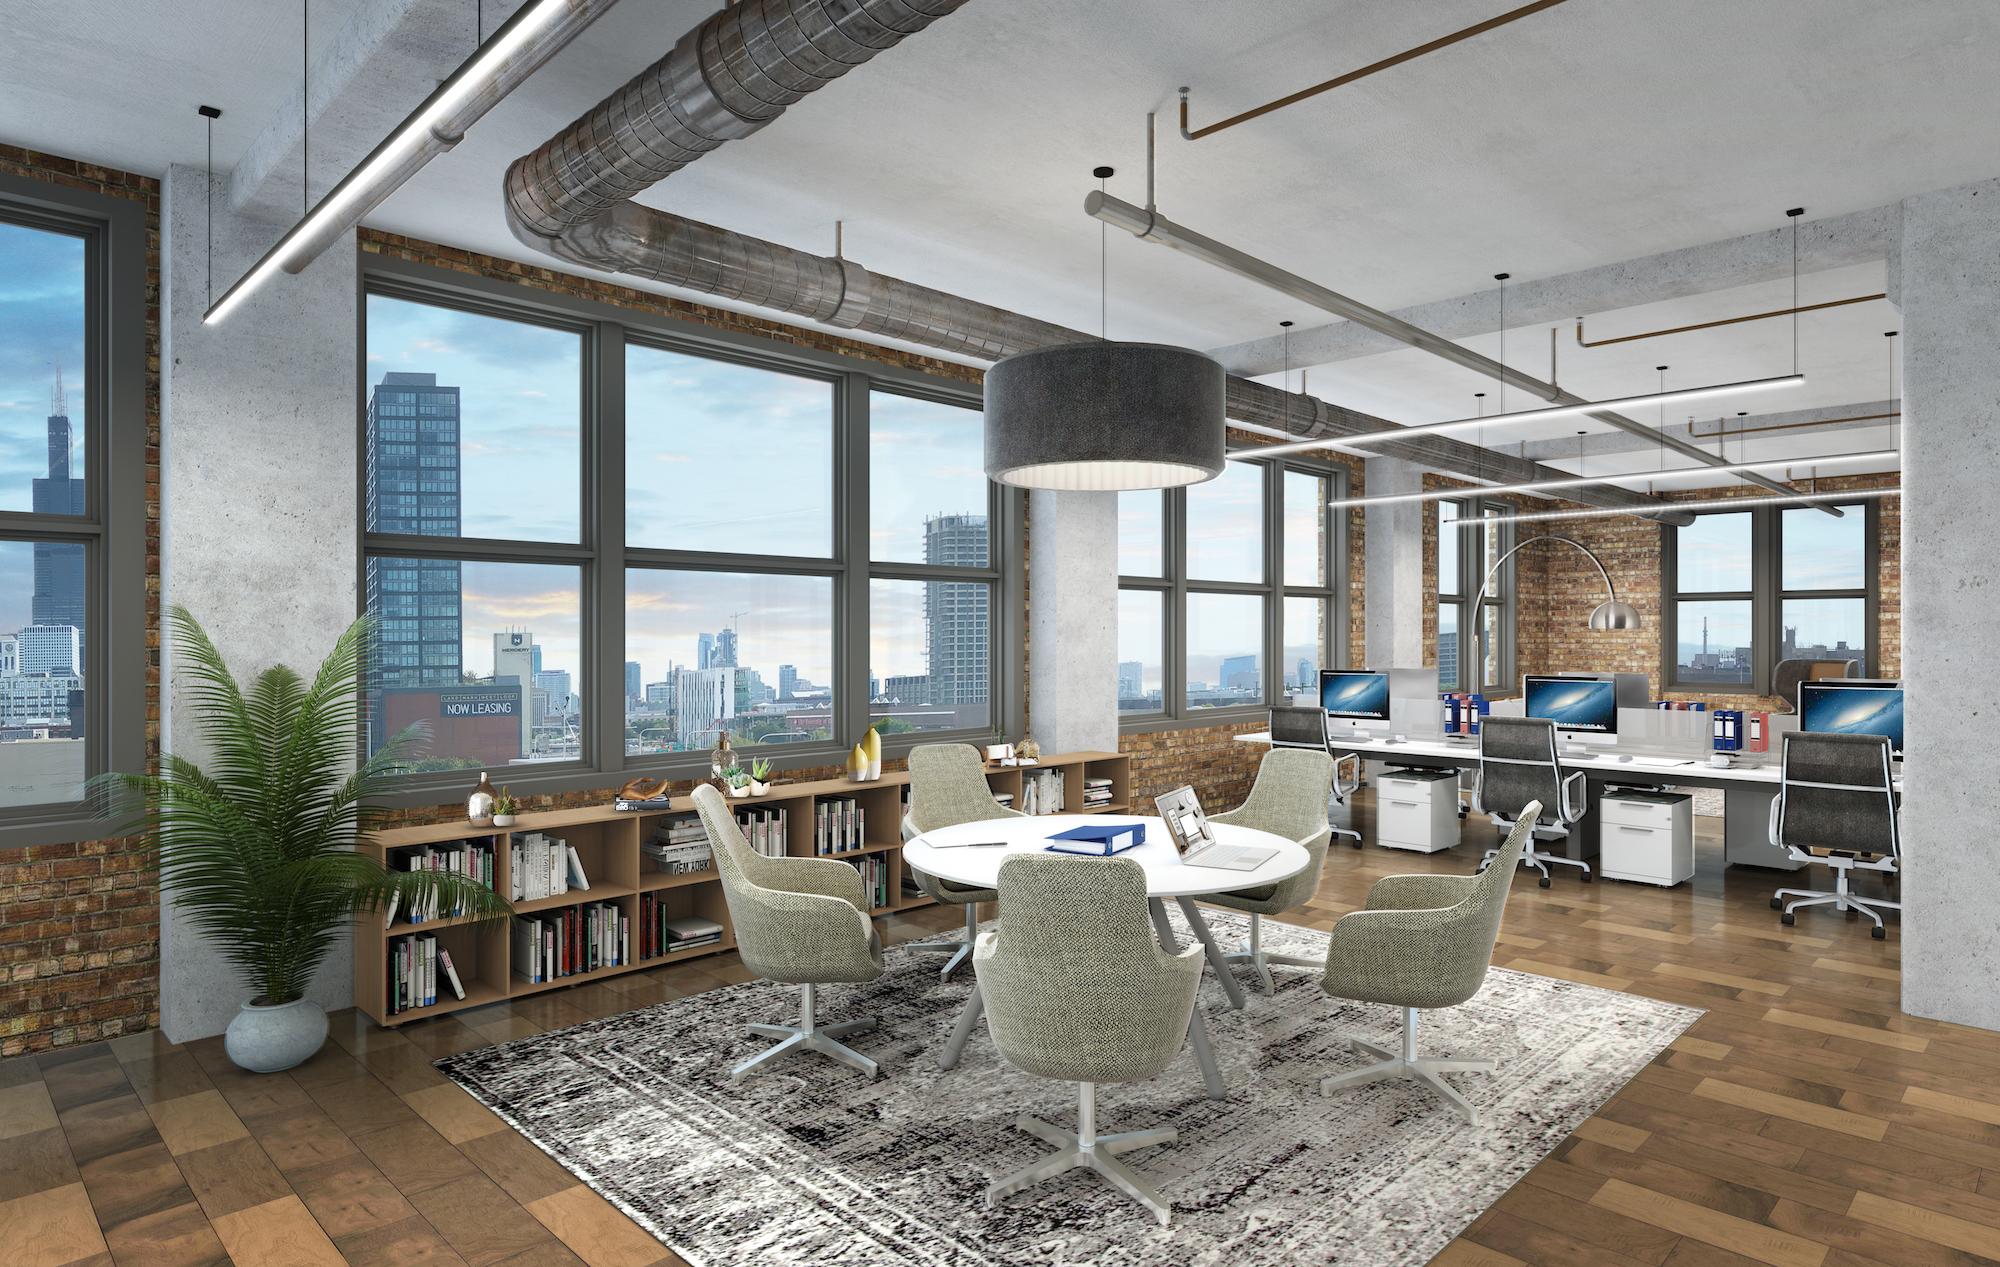 7th Floor Tenant Office Mock-up